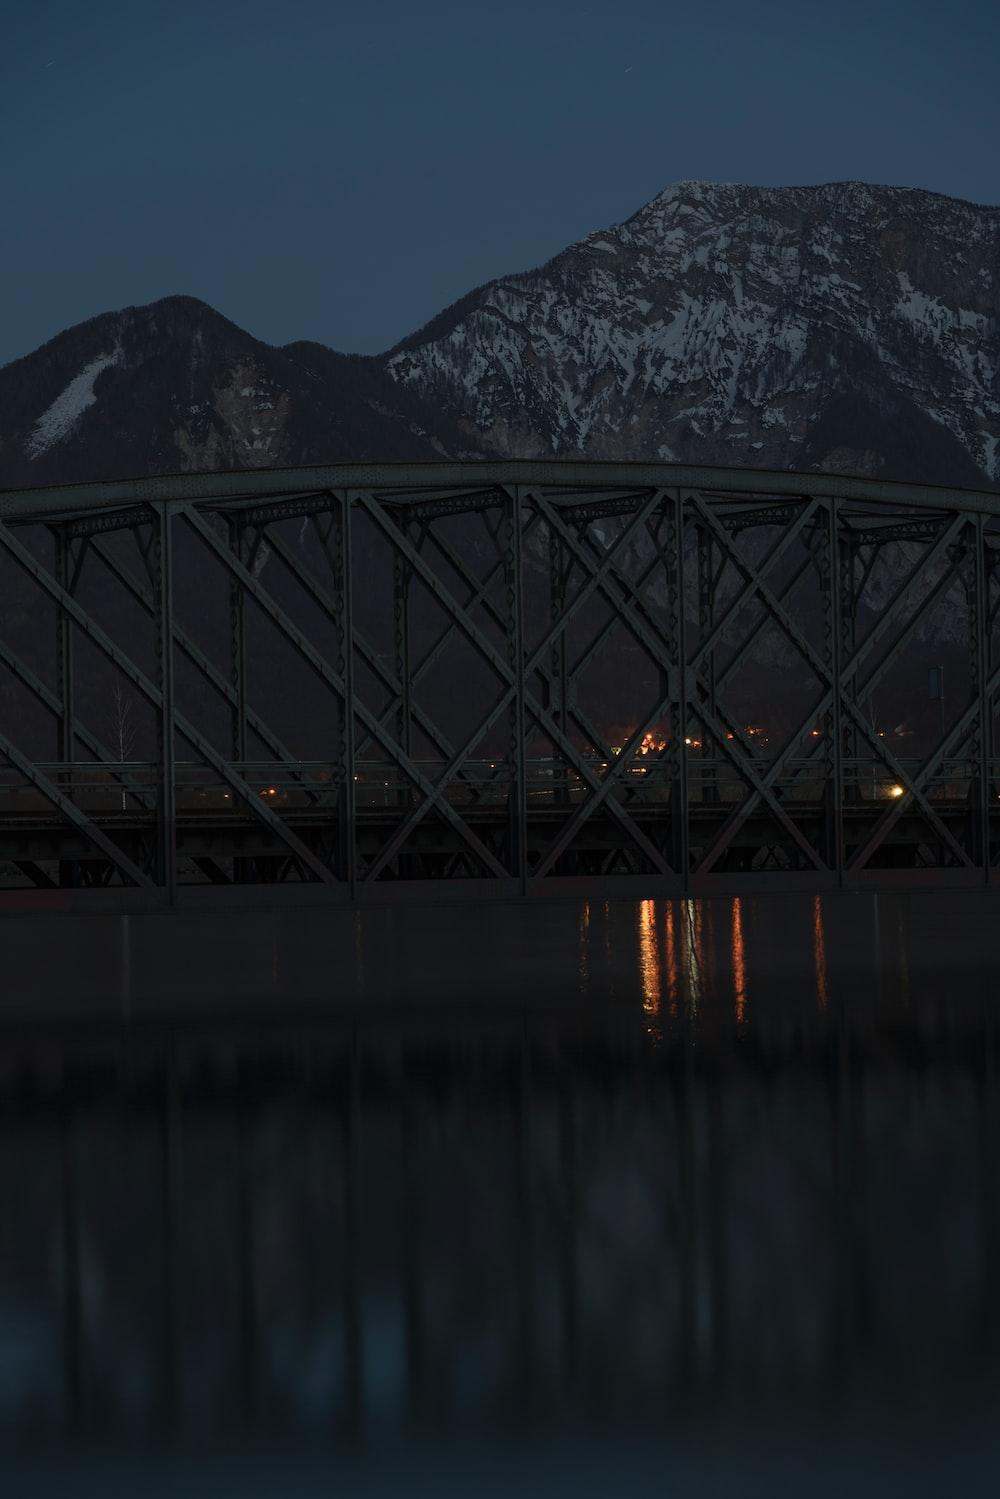 bridge beside mountain with snow